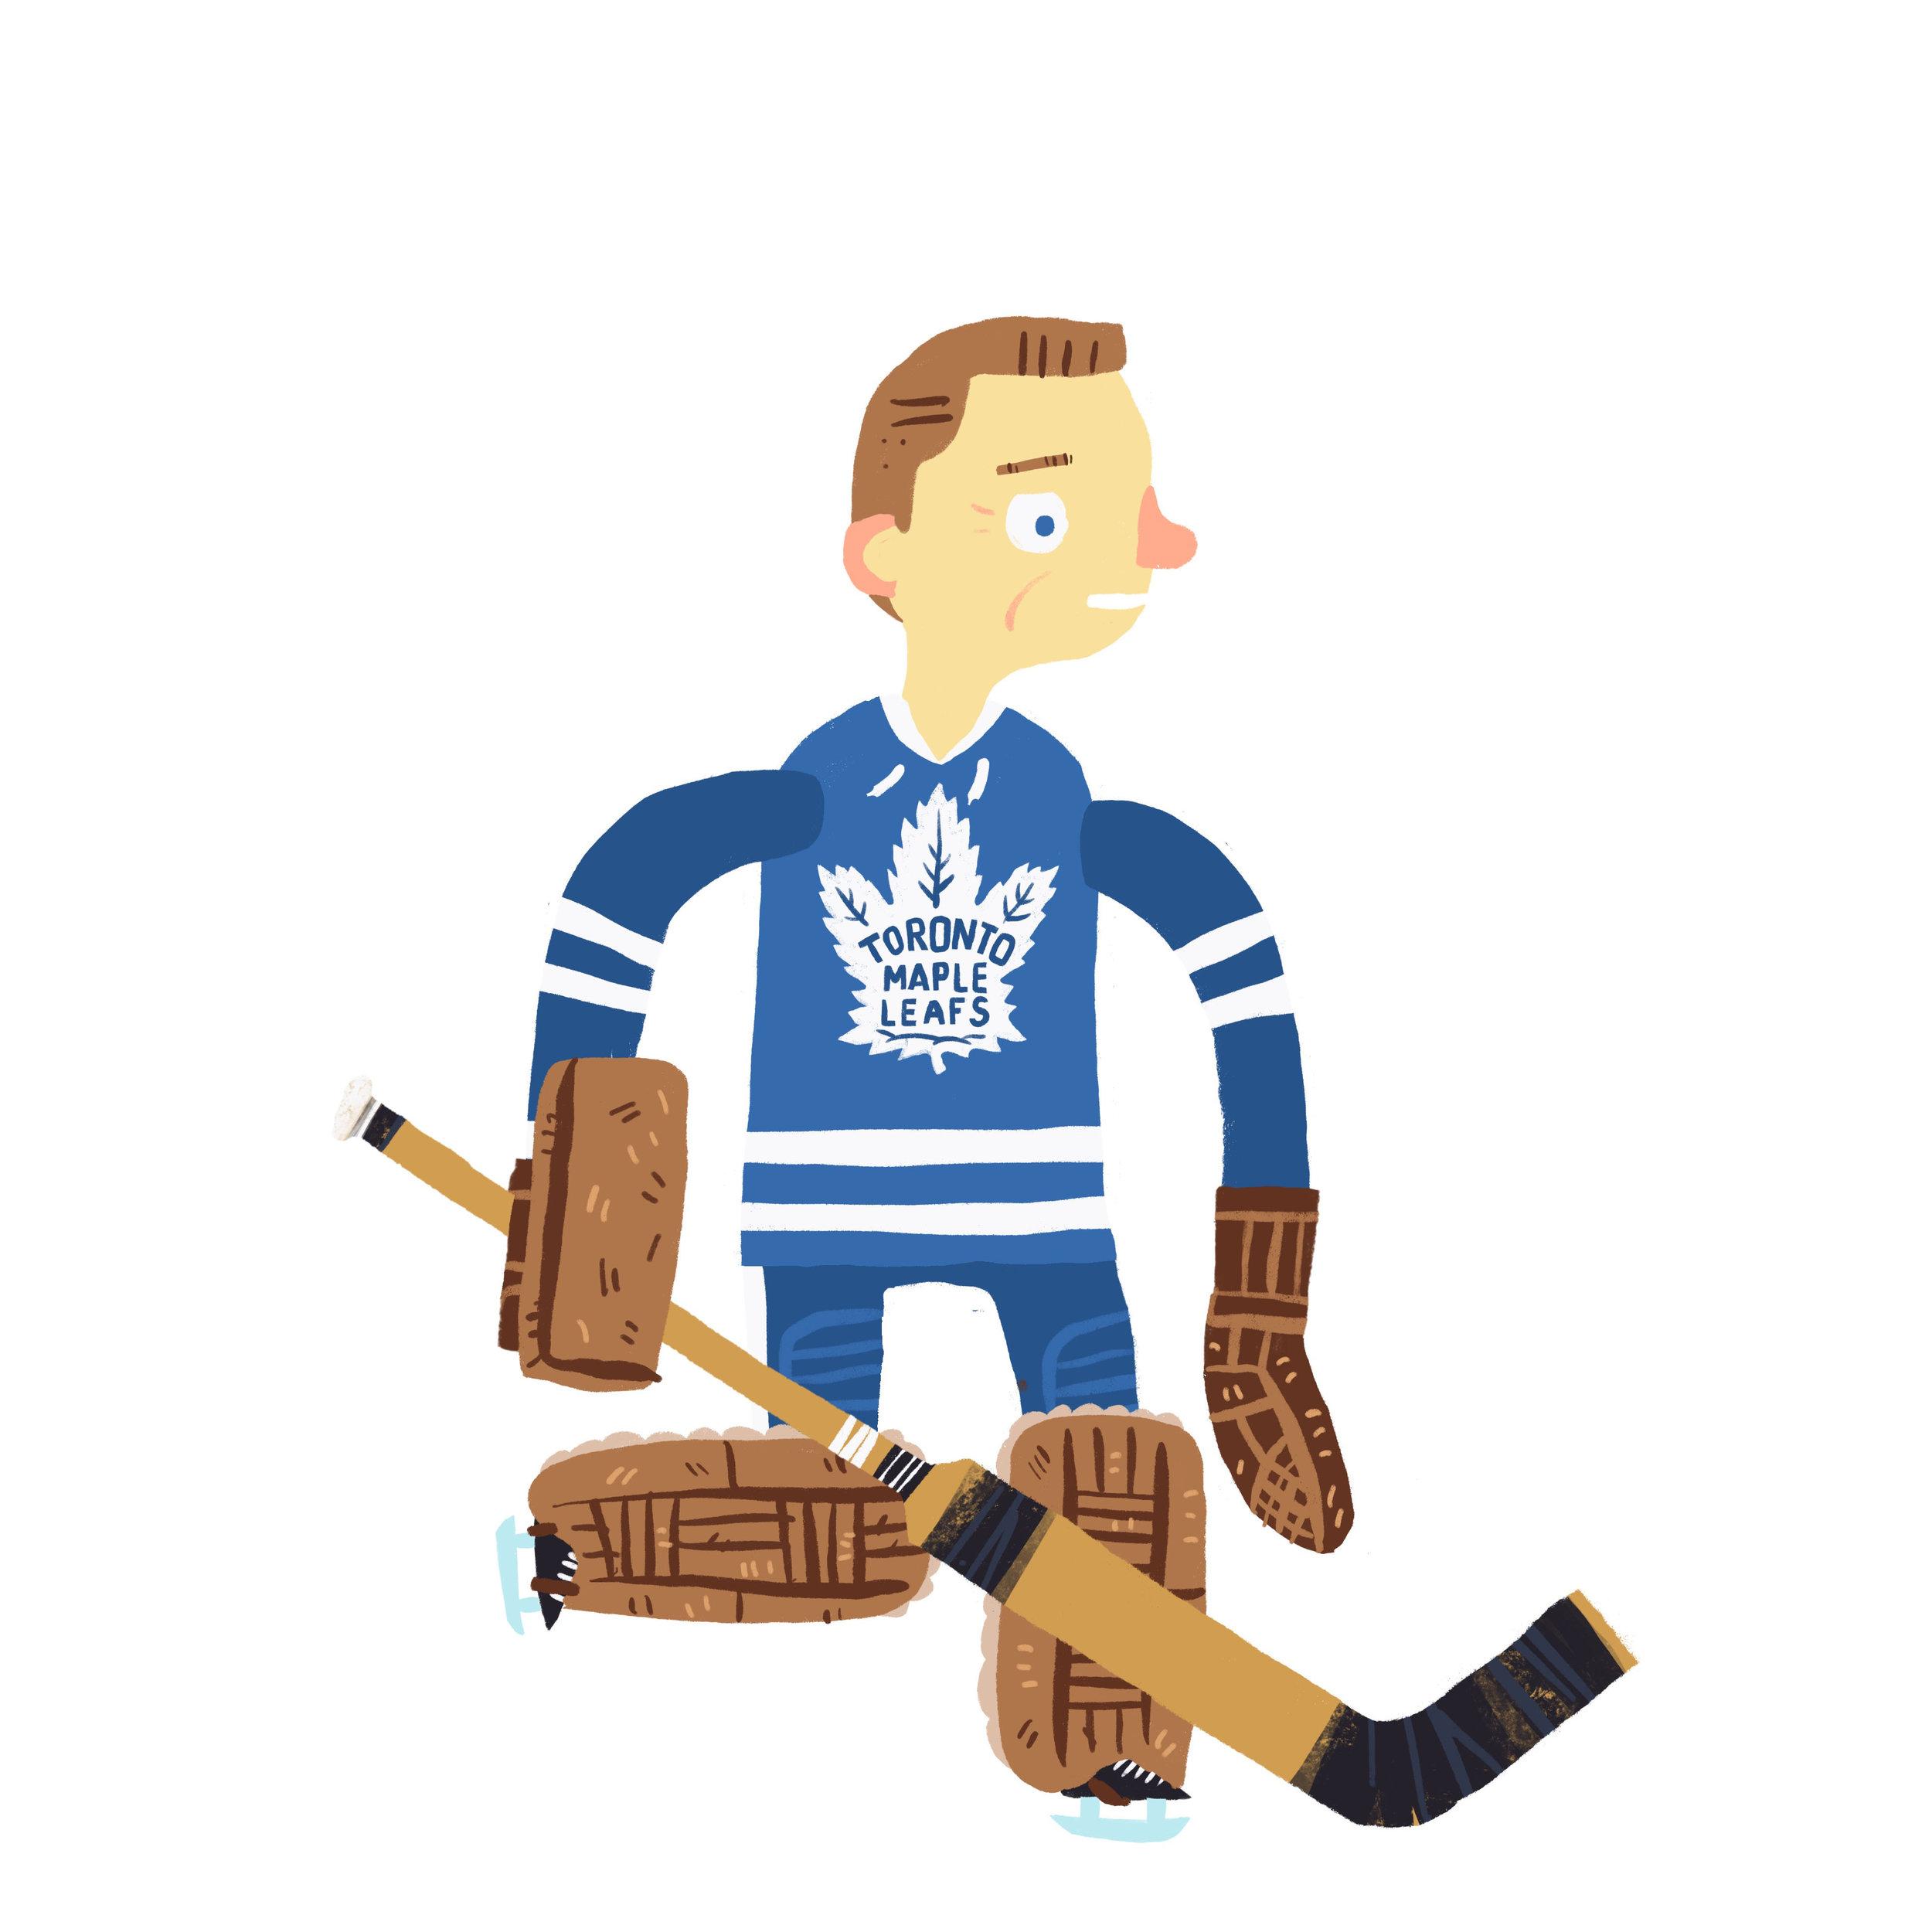 "JOHN WILLIAM BOWER ""THE CHINA WALL"", b. Prince Albert, SK Toronto Maple Leafs (1958-70)"